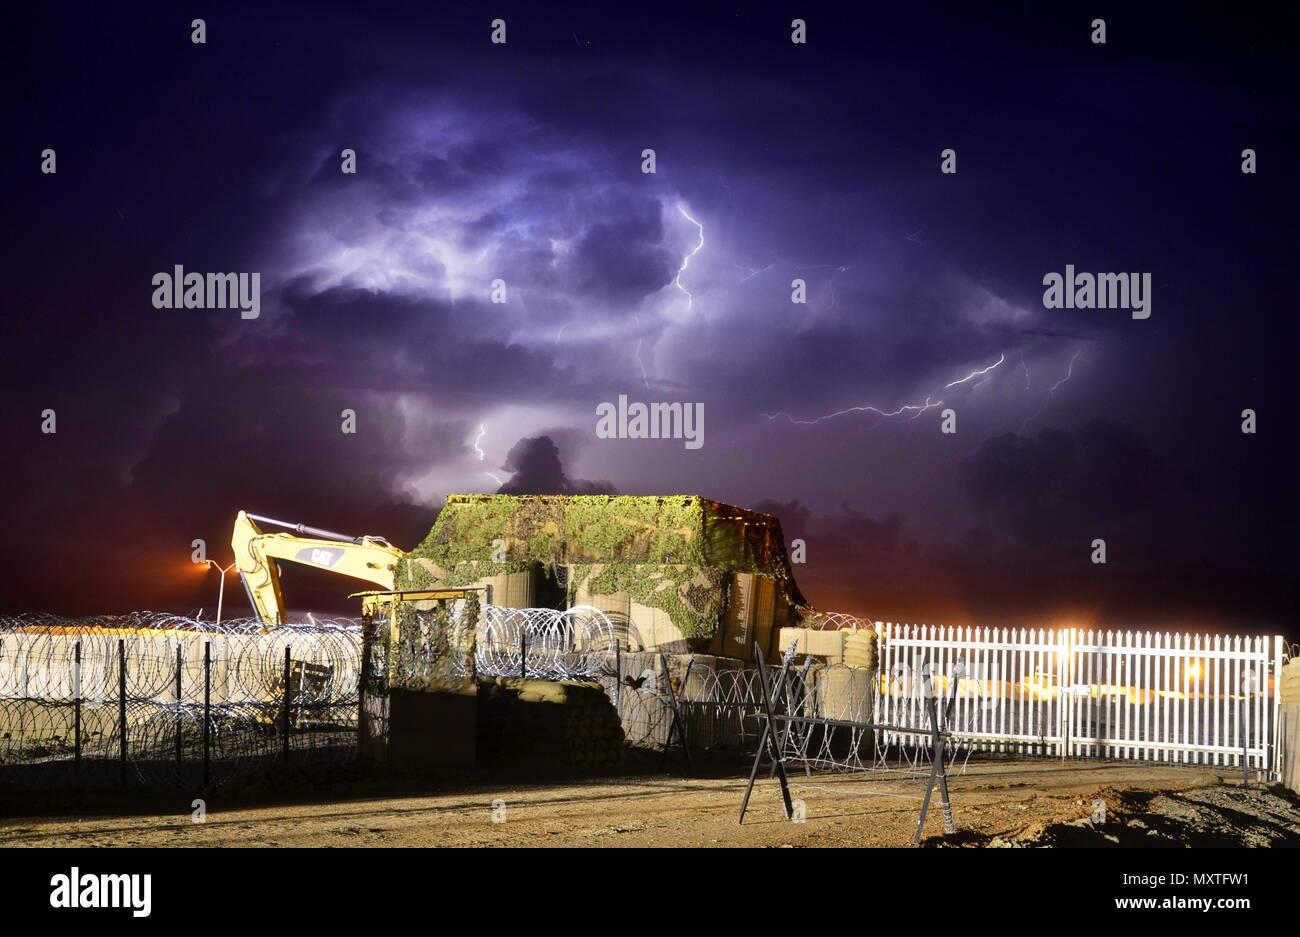 Lightning Storm Above Camp Malakal - Stock Image